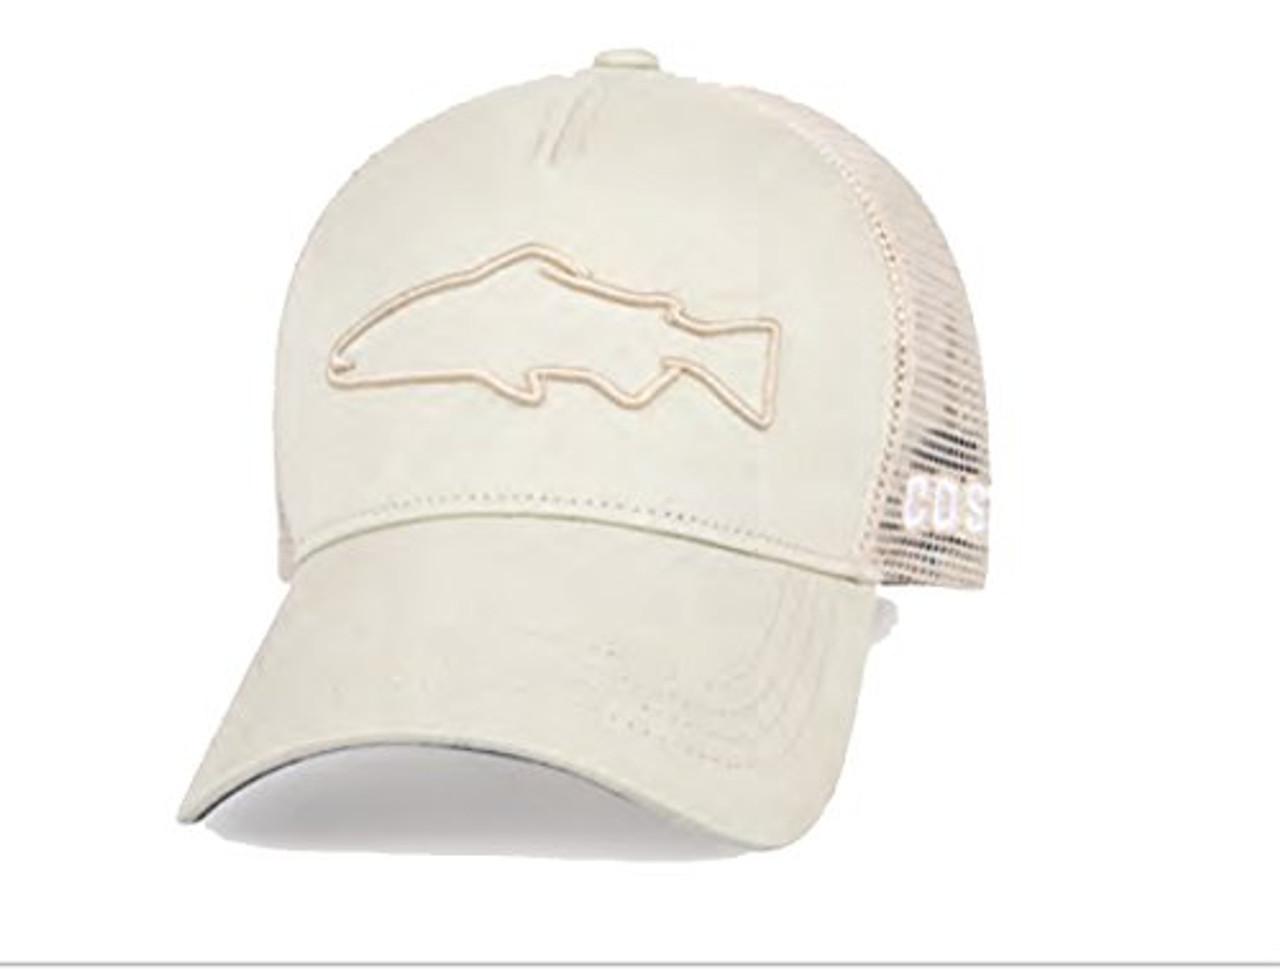 b6dc65822c1c1 Costa Del Mar Stealth Trout Trucker Hat - Trenz Shirt Company